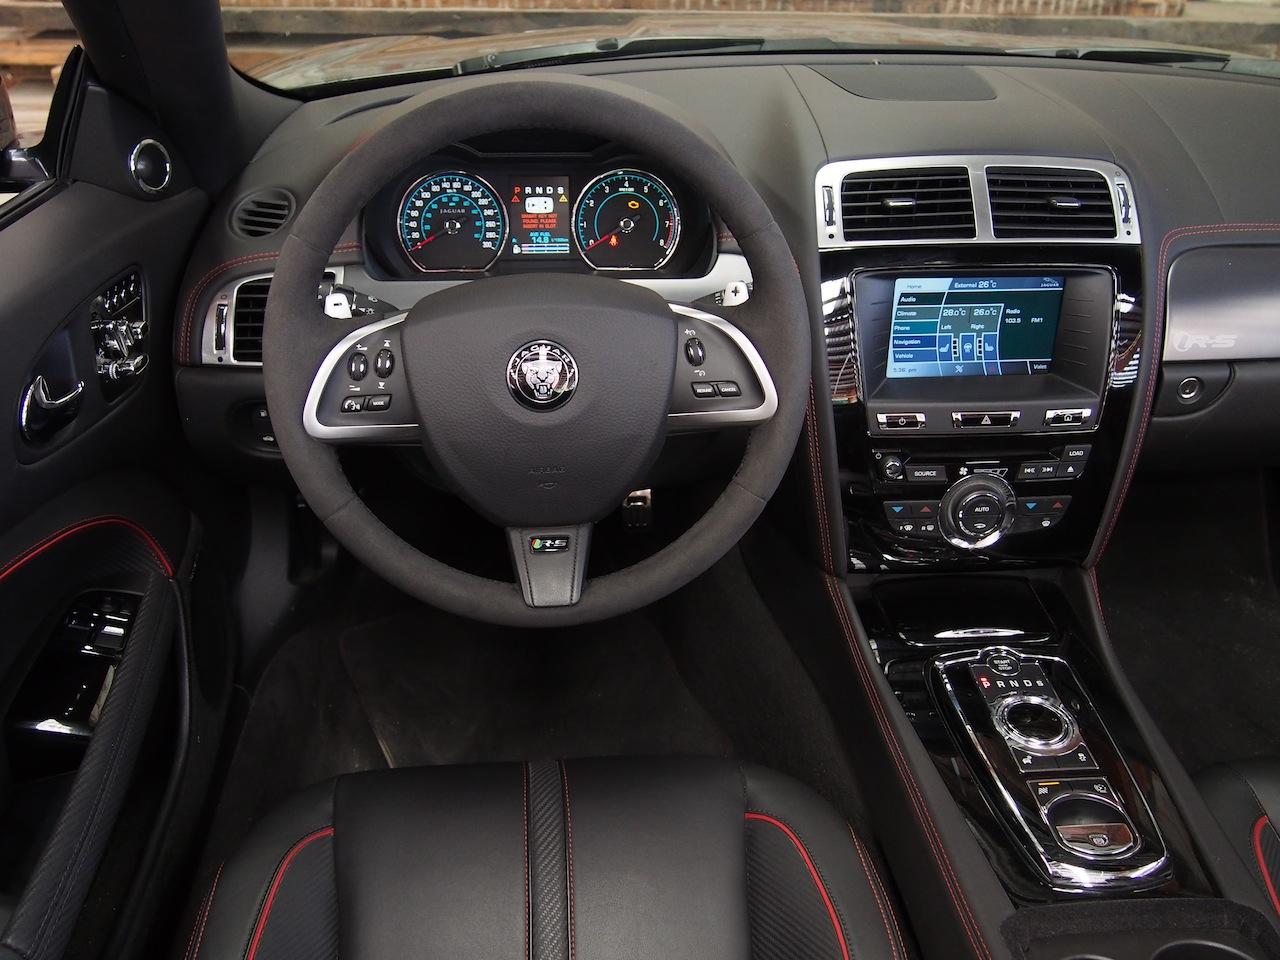 2015 jaguar xkr s convertible black interior steering wheel dashboard